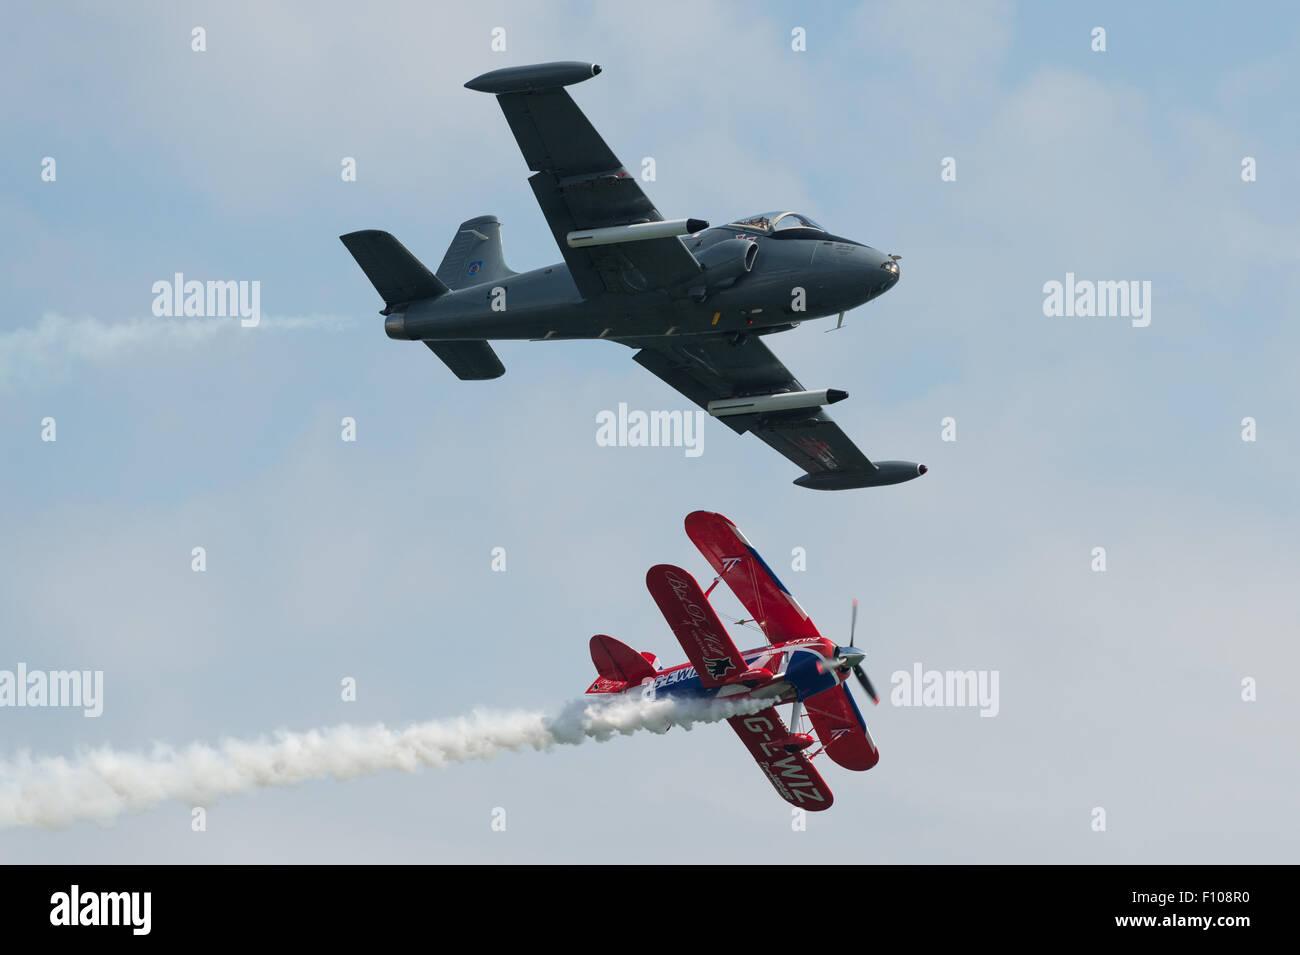 BAC Strikemaster jet trainer e ricca Goodwin's muscolo biplano Pitts volare insieme a Dawlish Air Show 2015. Immagini Stock